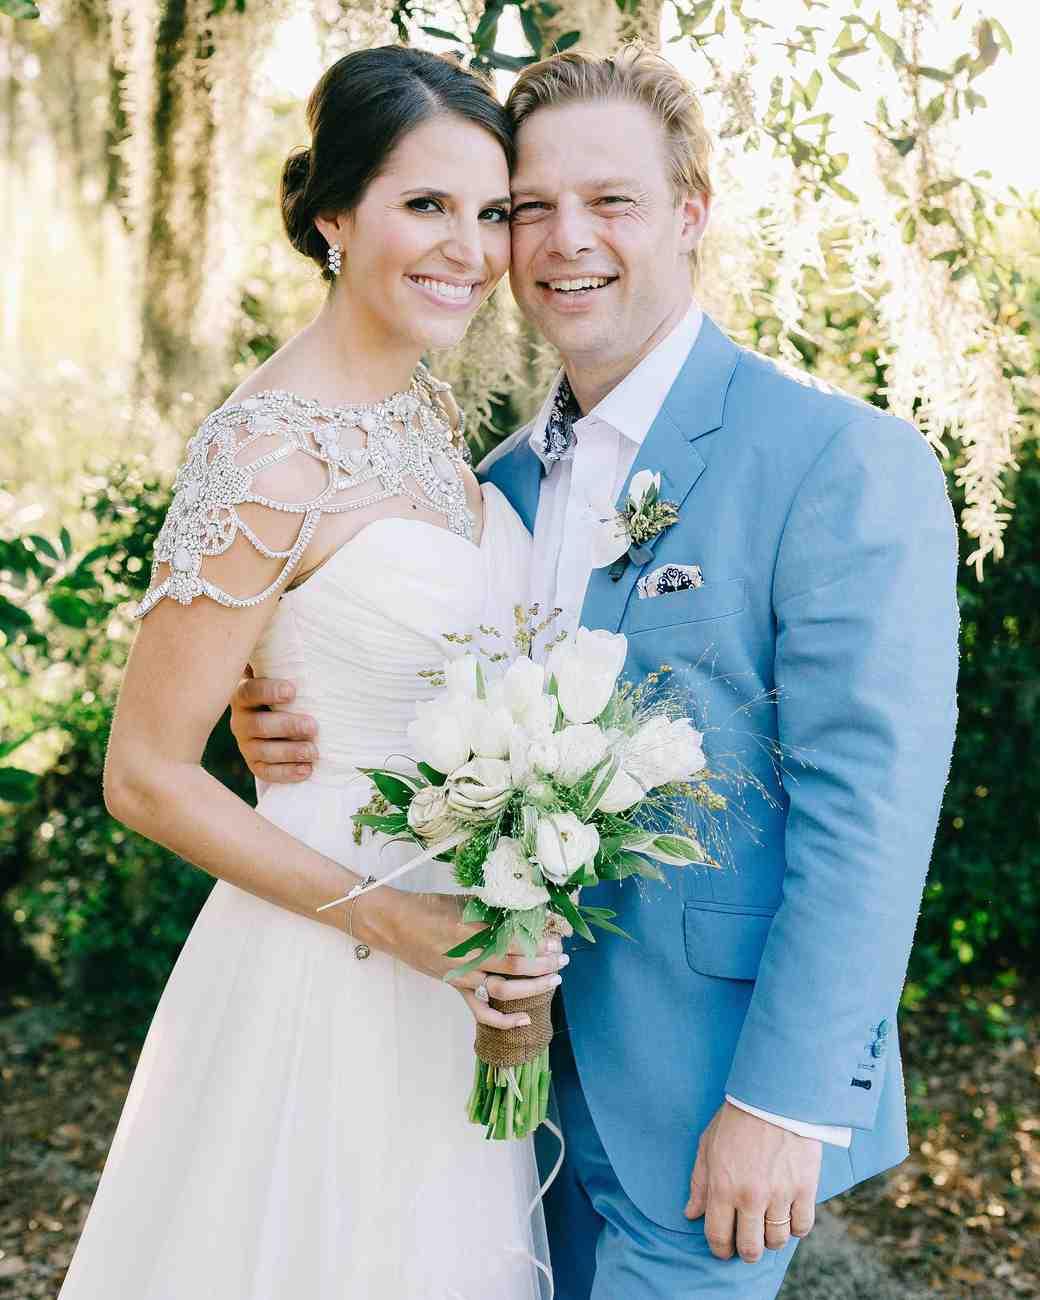 rachel-jurrie-nautical-wedding-couple-0742-s112778-0416.jpg